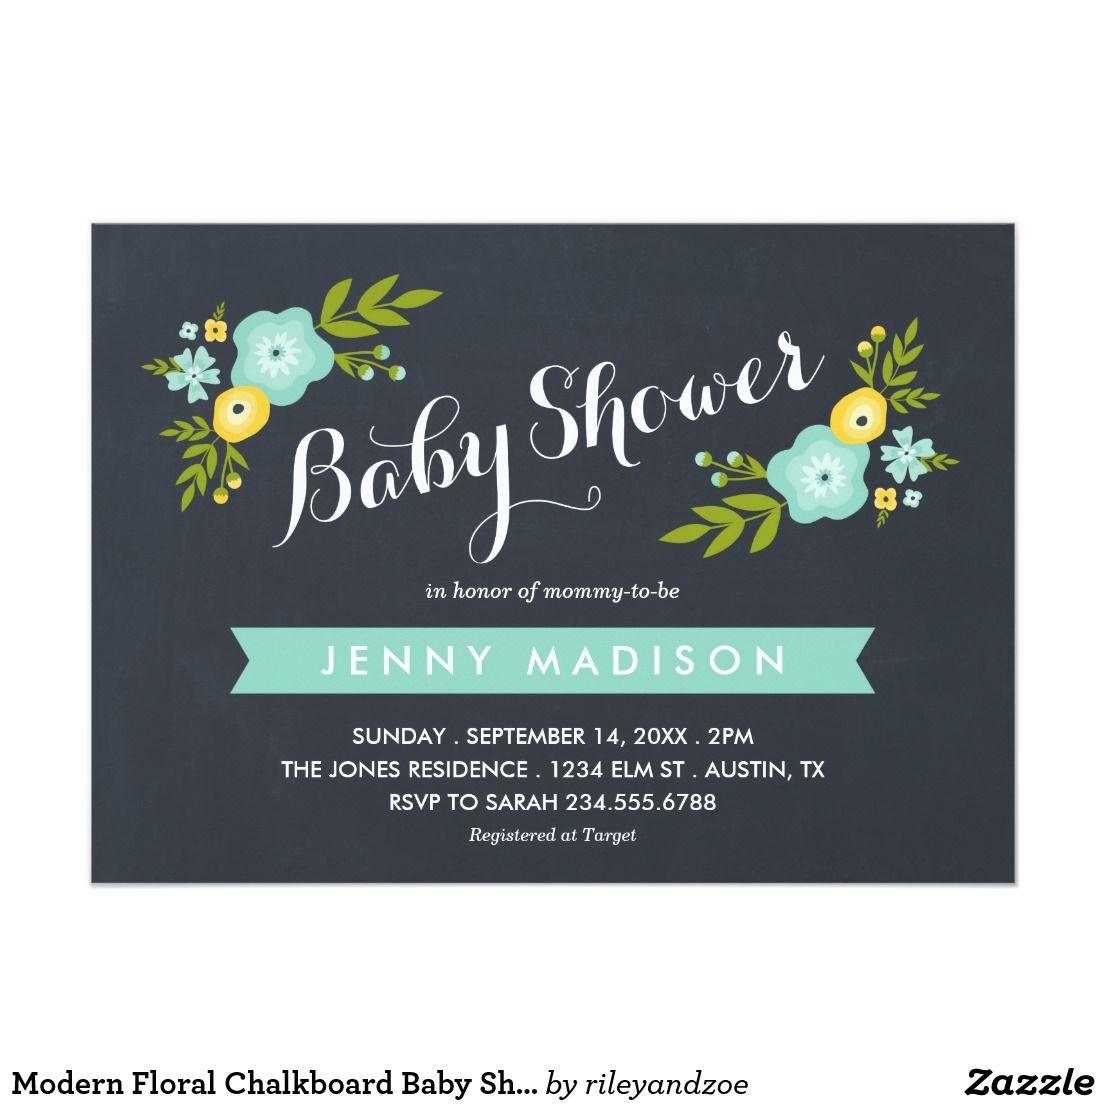 Modern floral chalkboard baby shower invitation sweet trendy modern floral chalkboard baby shower invitation sweet trendy chalkboard typography baby shower invitation with cute modern filmwisefo